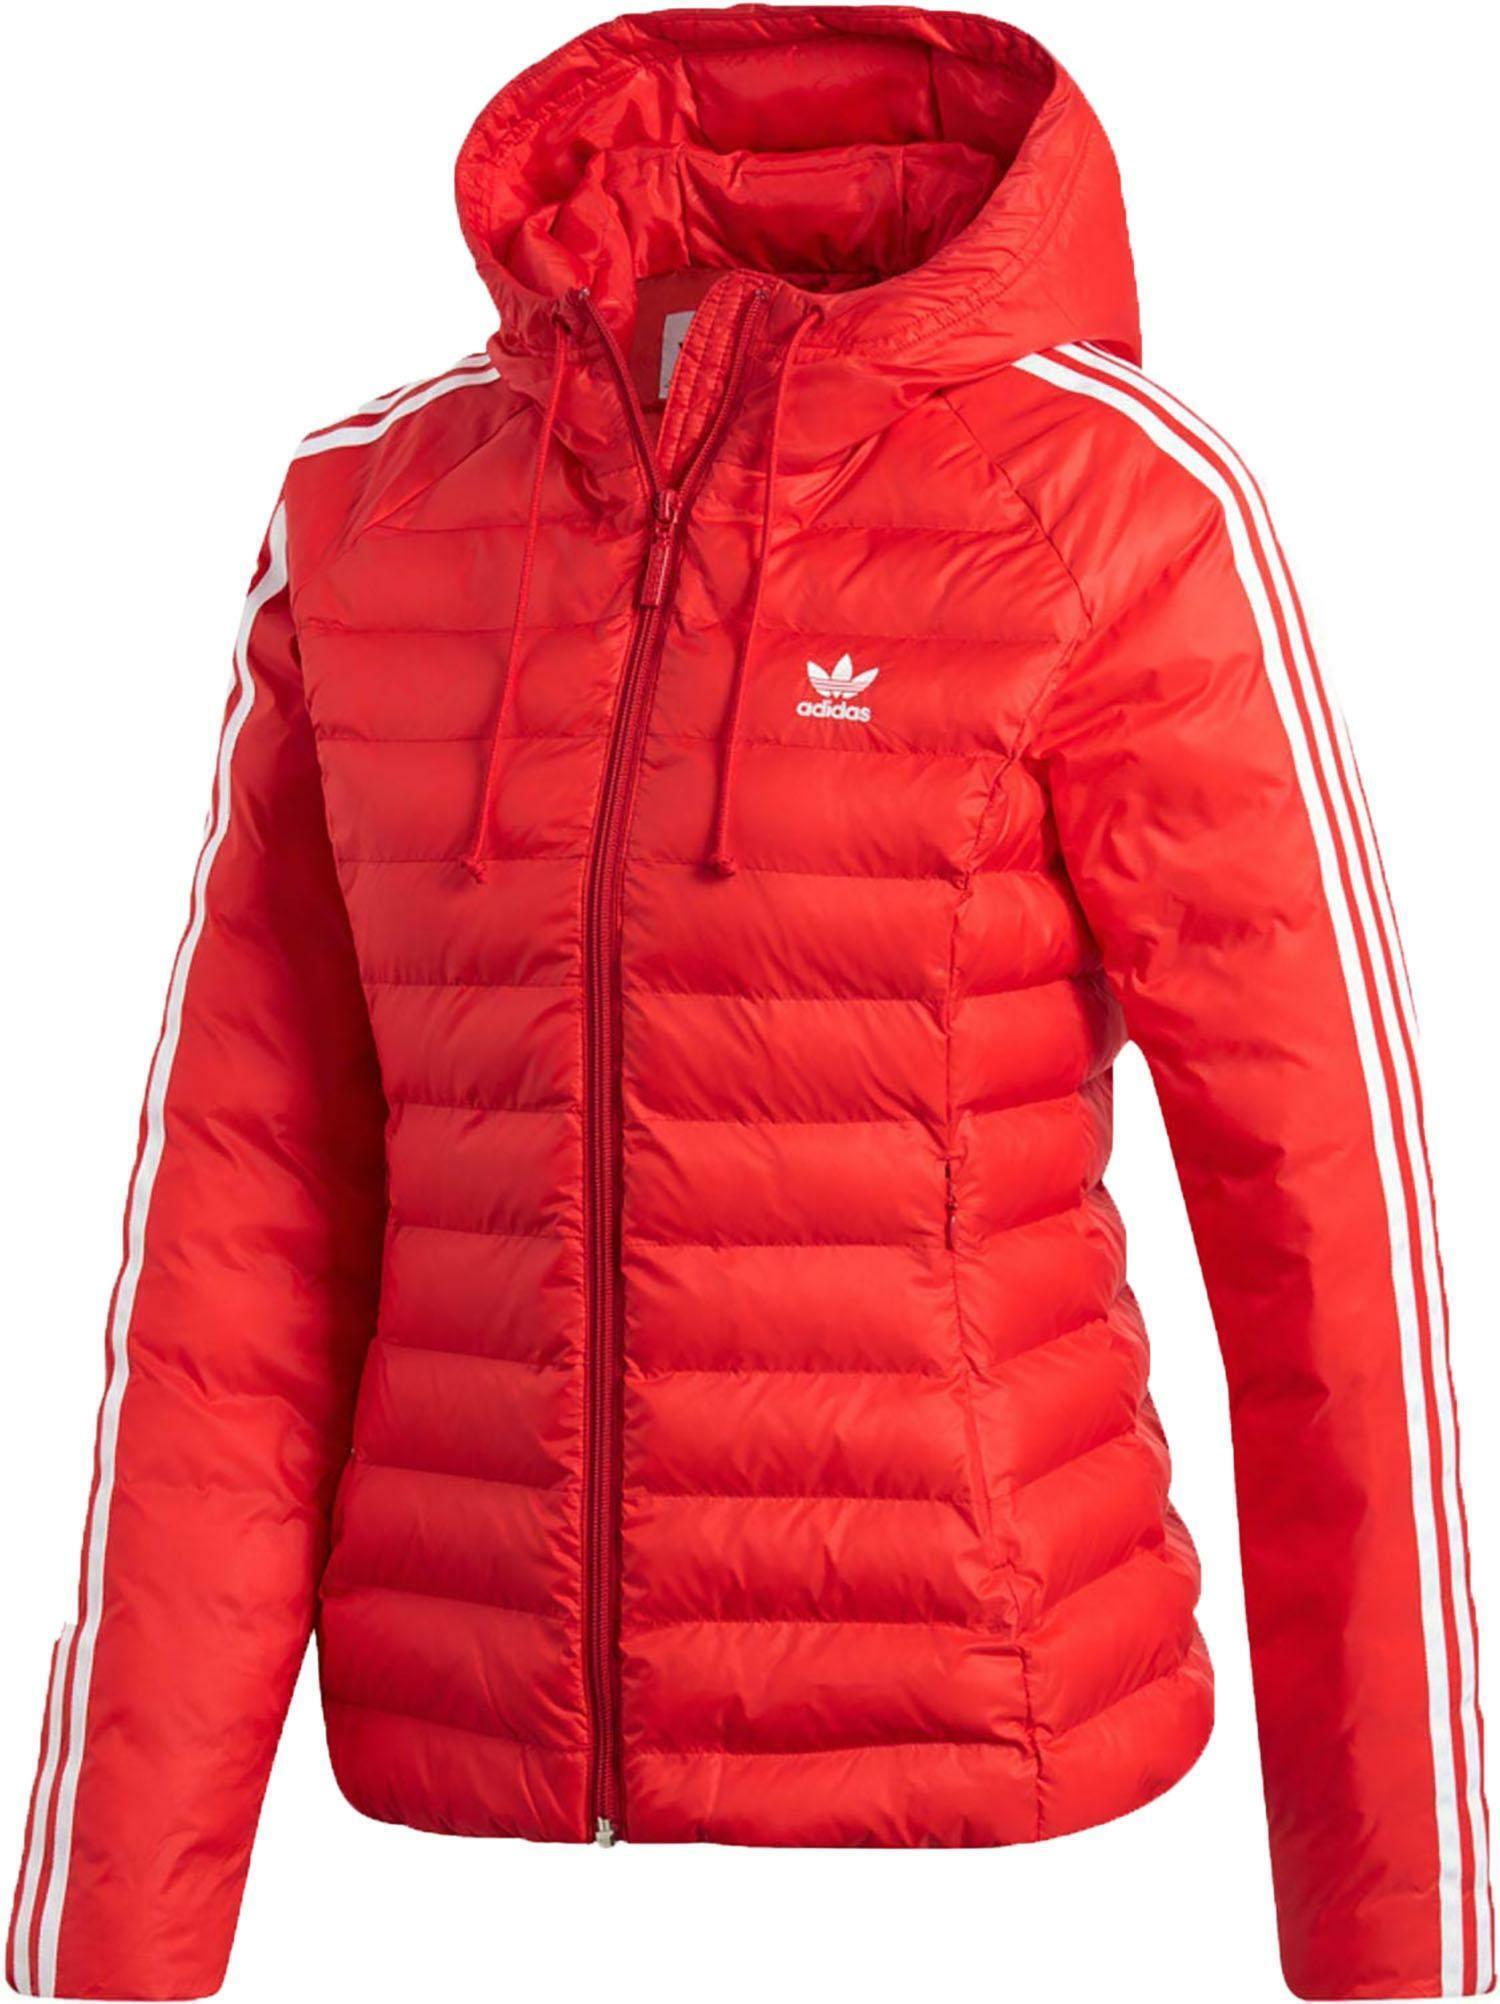 reputable site 896b2 53716 Adidas slim jacket giubbotto donna rosso ed4785